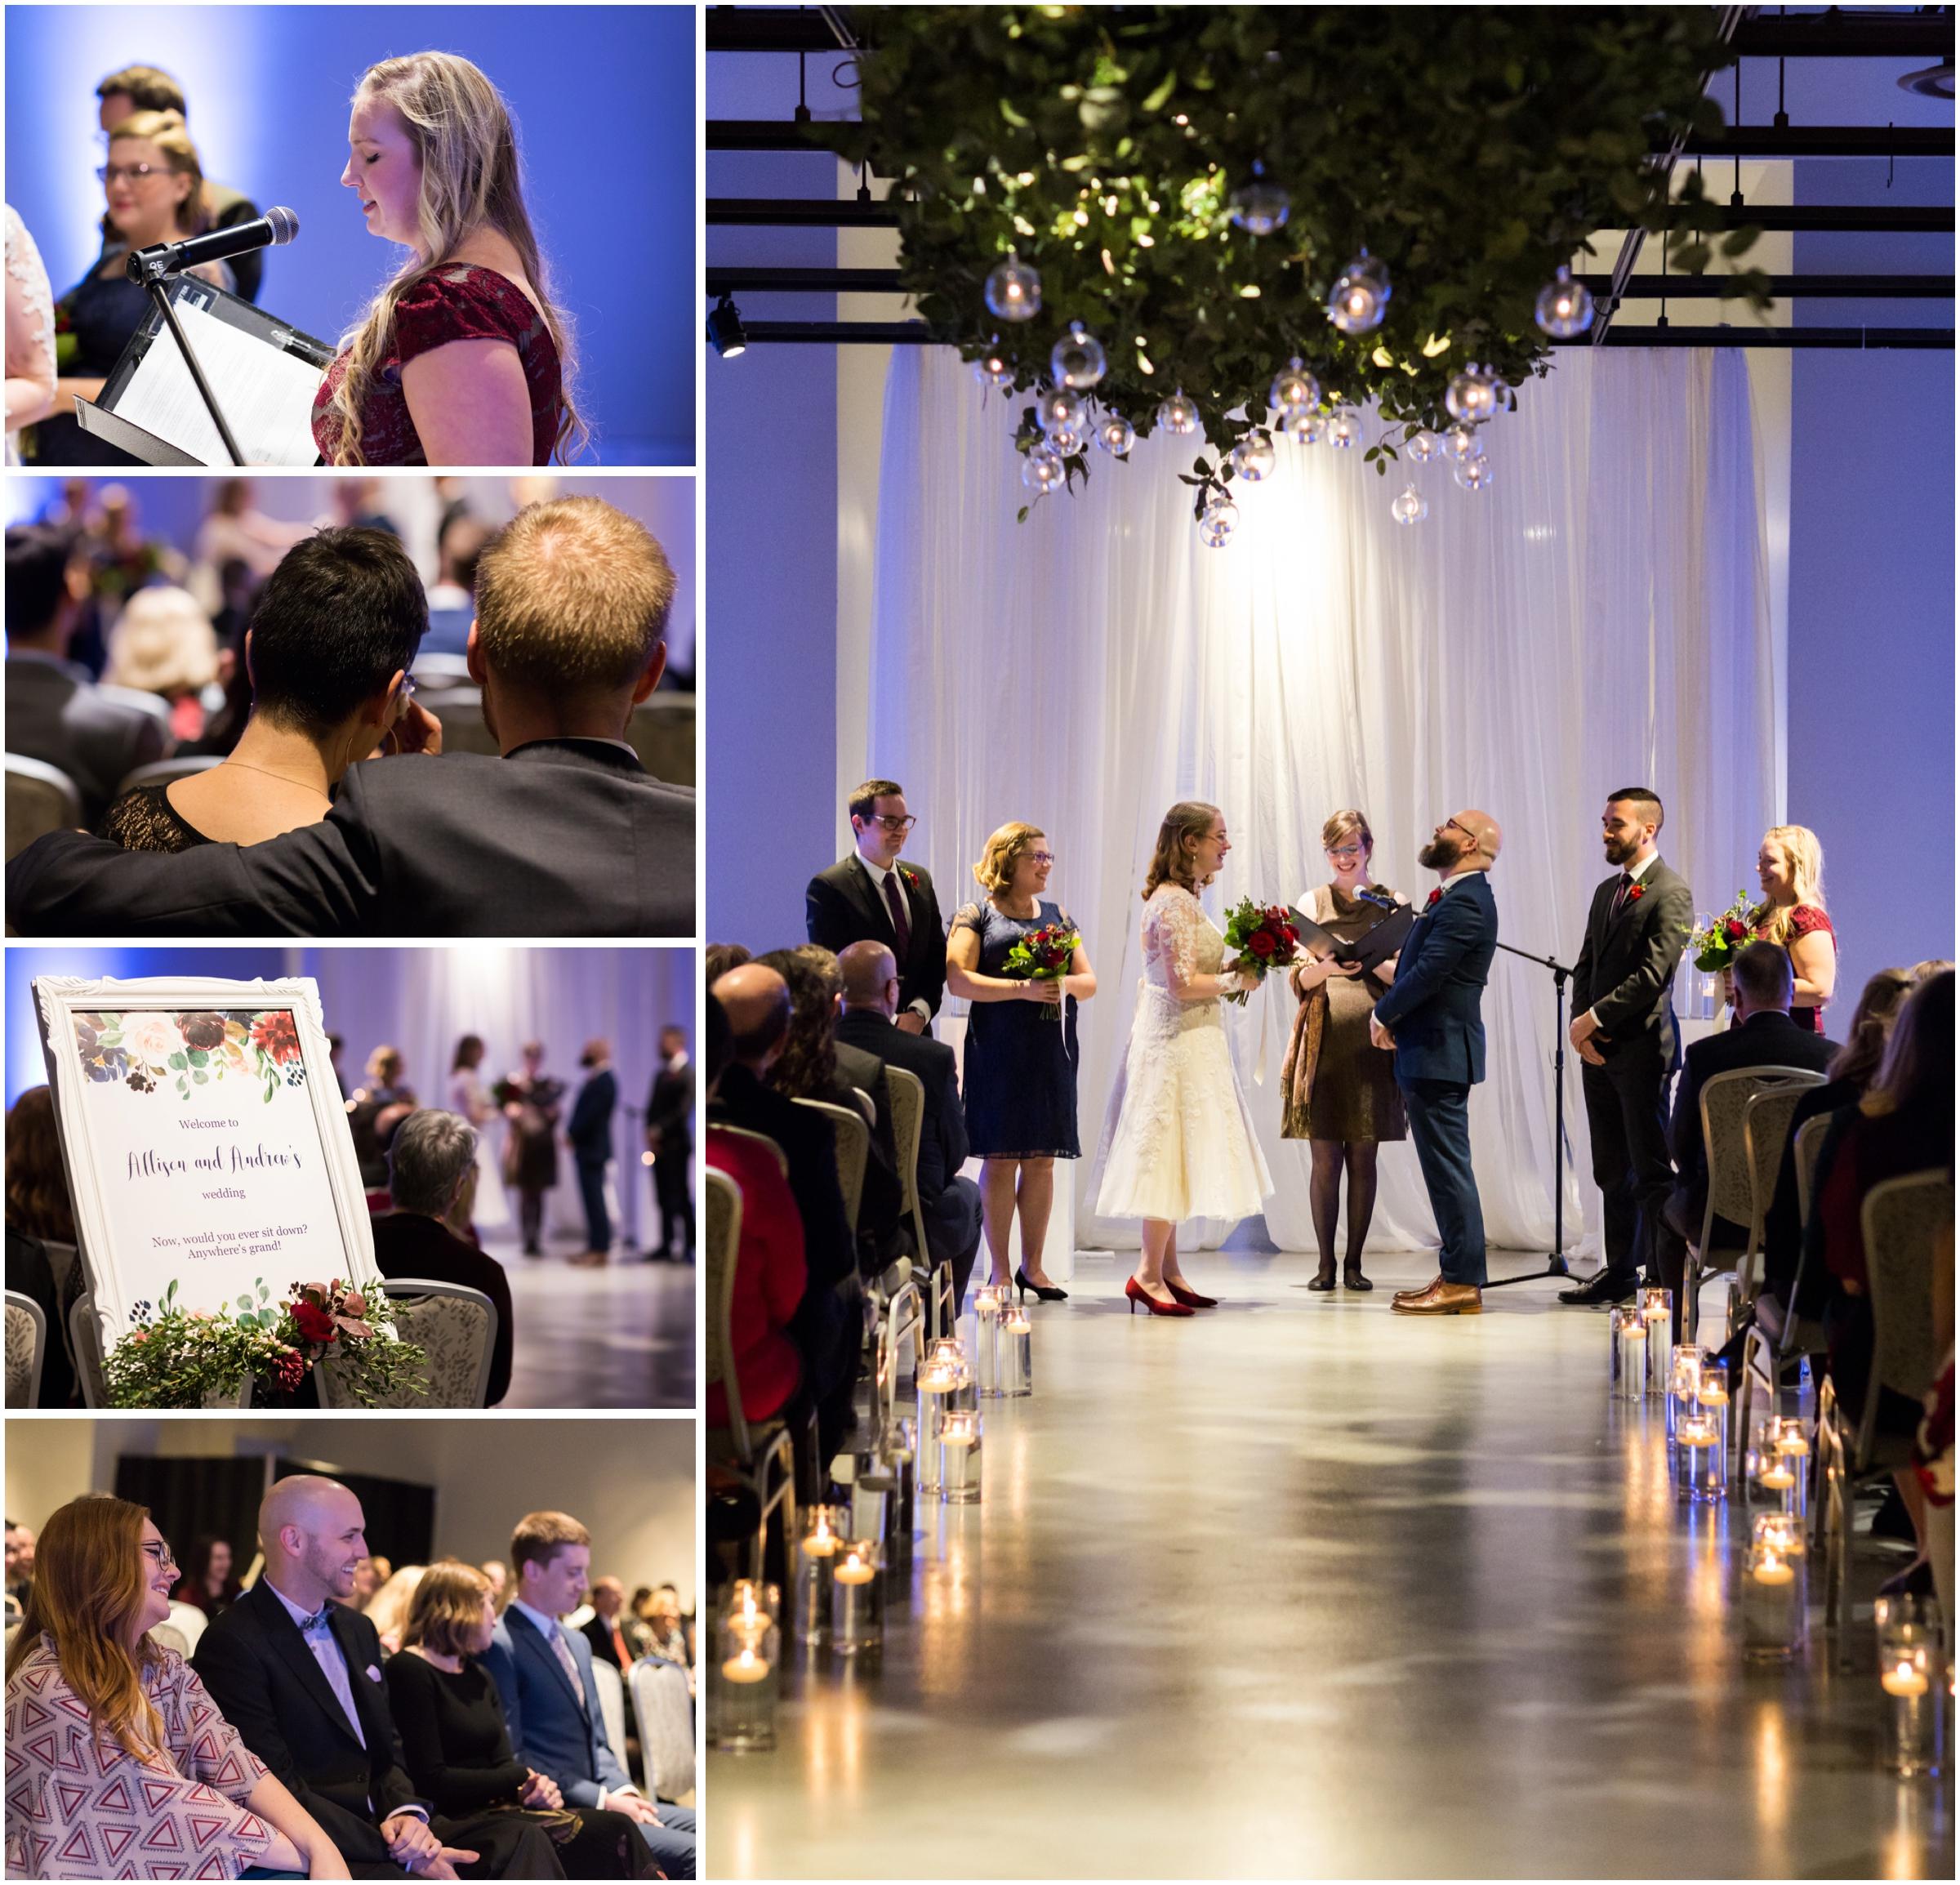 Ottaw Wedding Allison Andrew - (Selena Phillips-Boyle)_0071.jpg